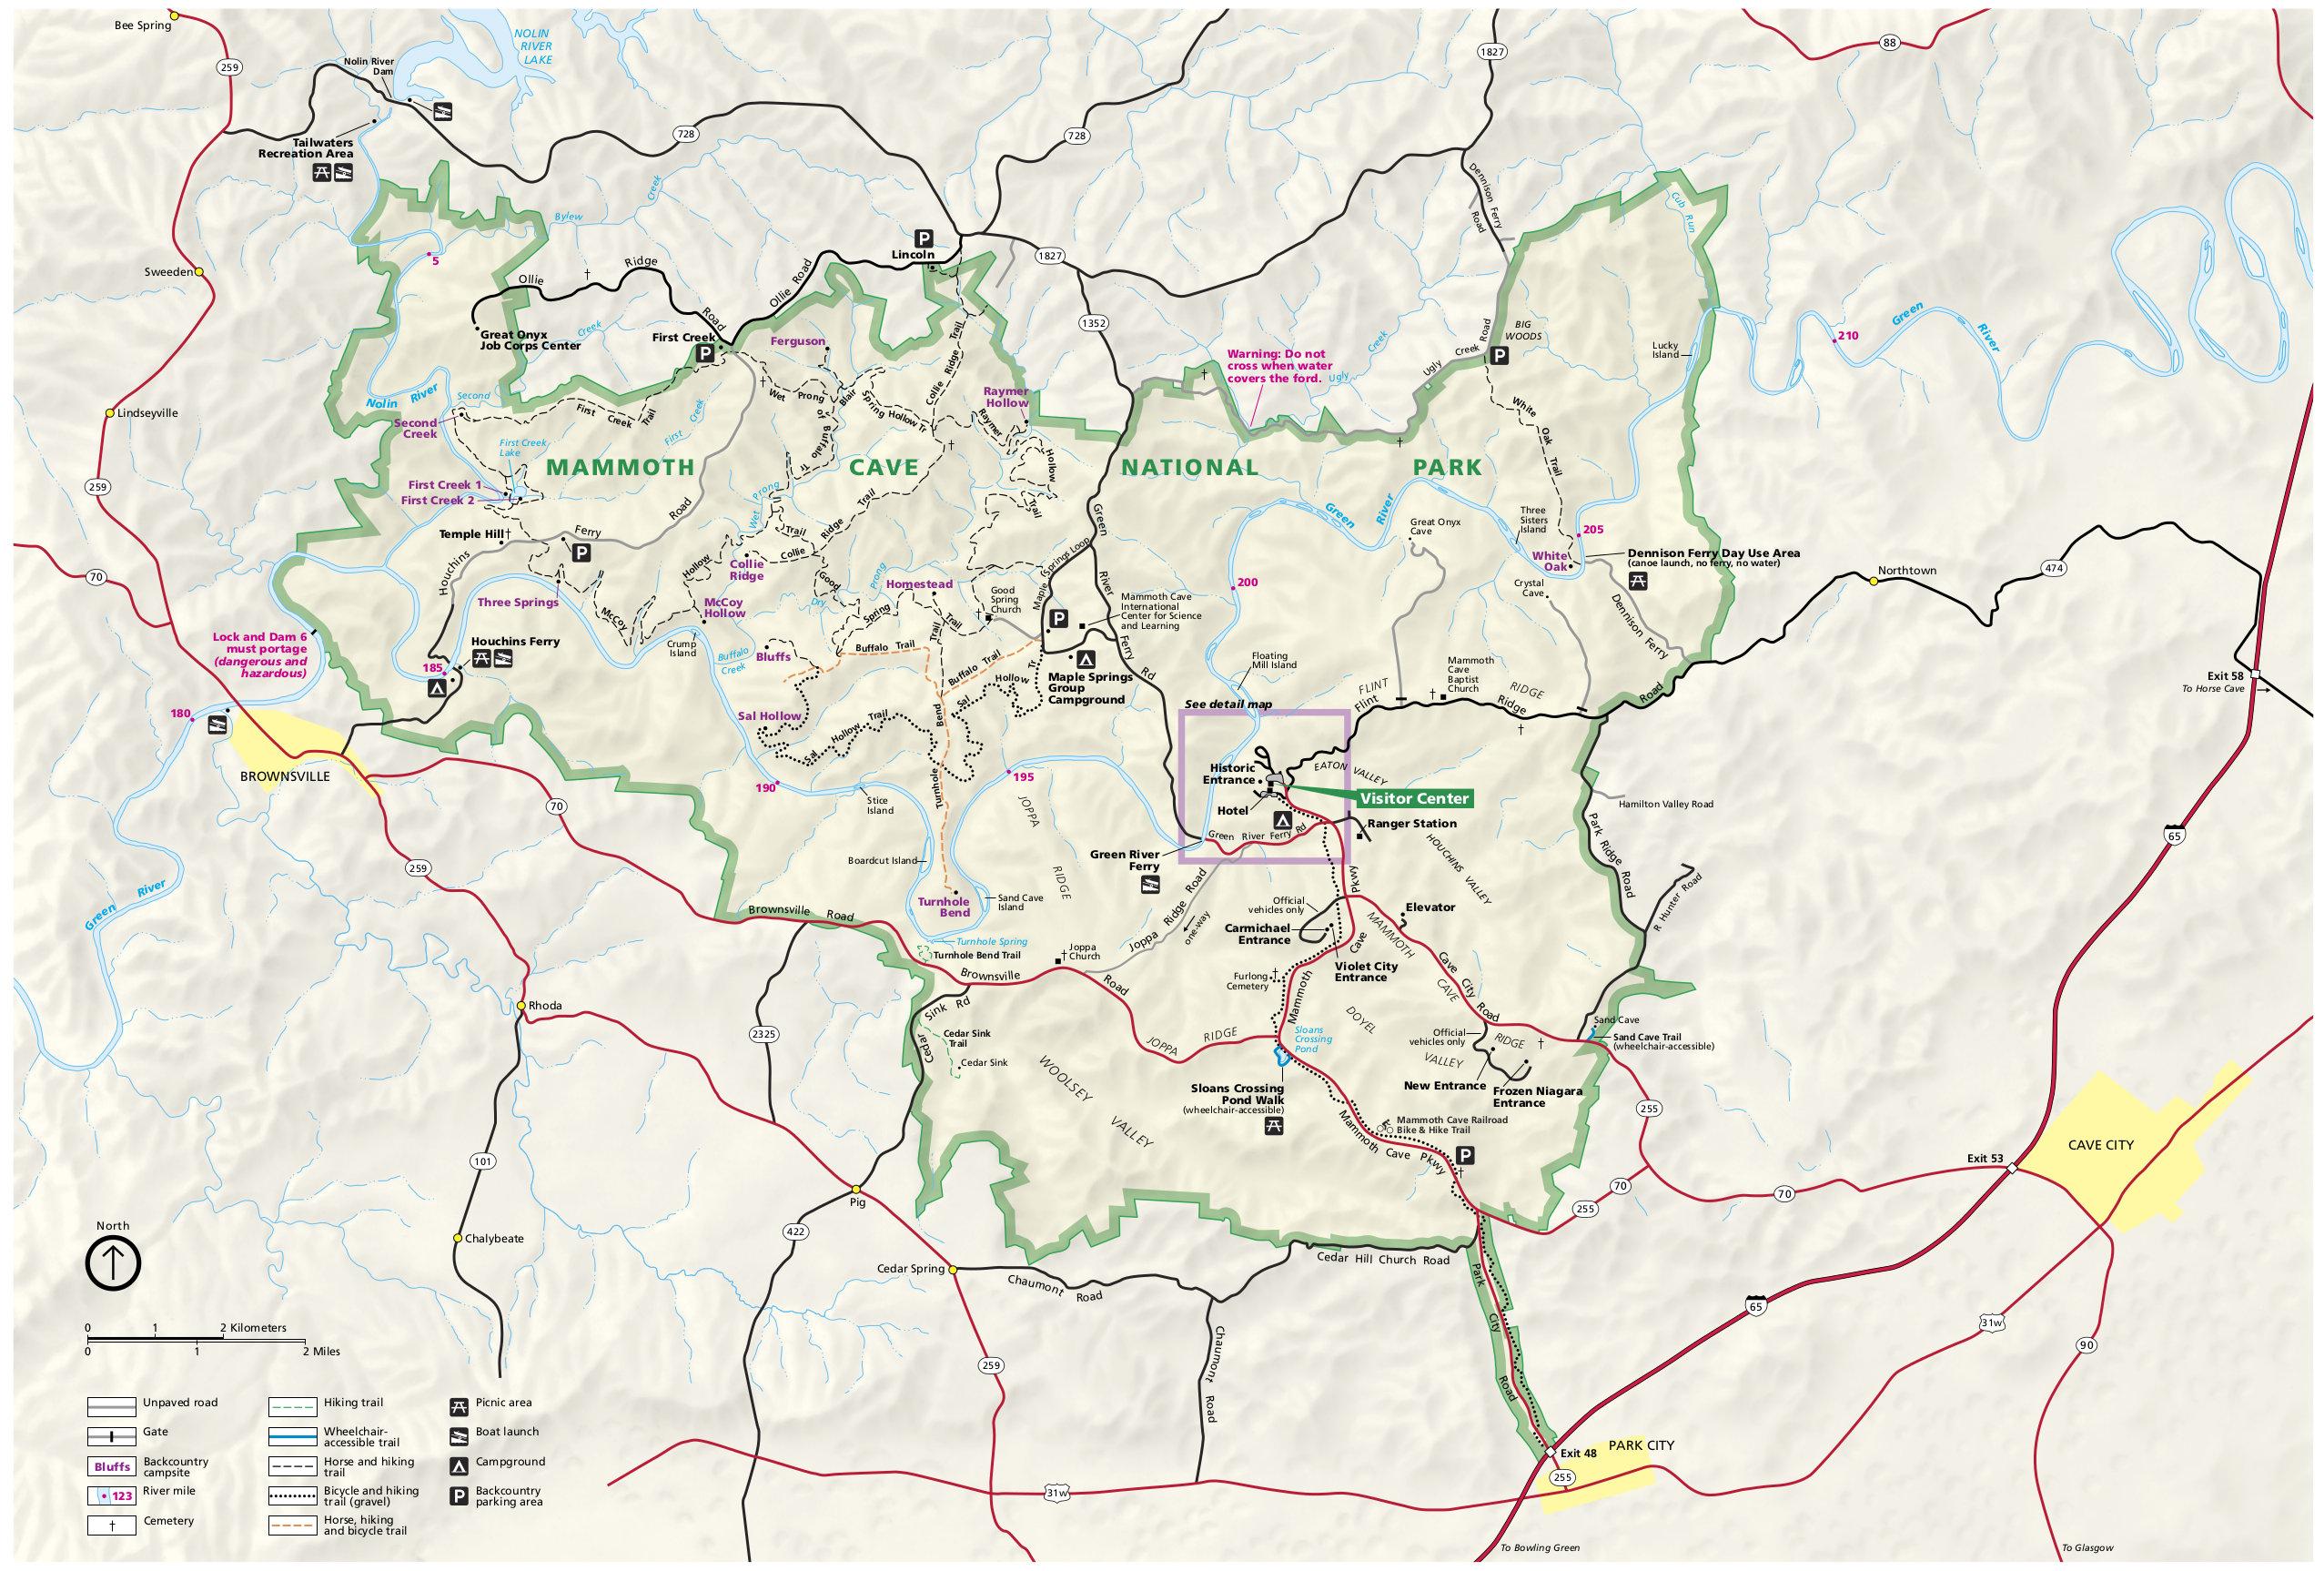 Datei:NPS mammoth-cave-map.jpg – Wikipedia on